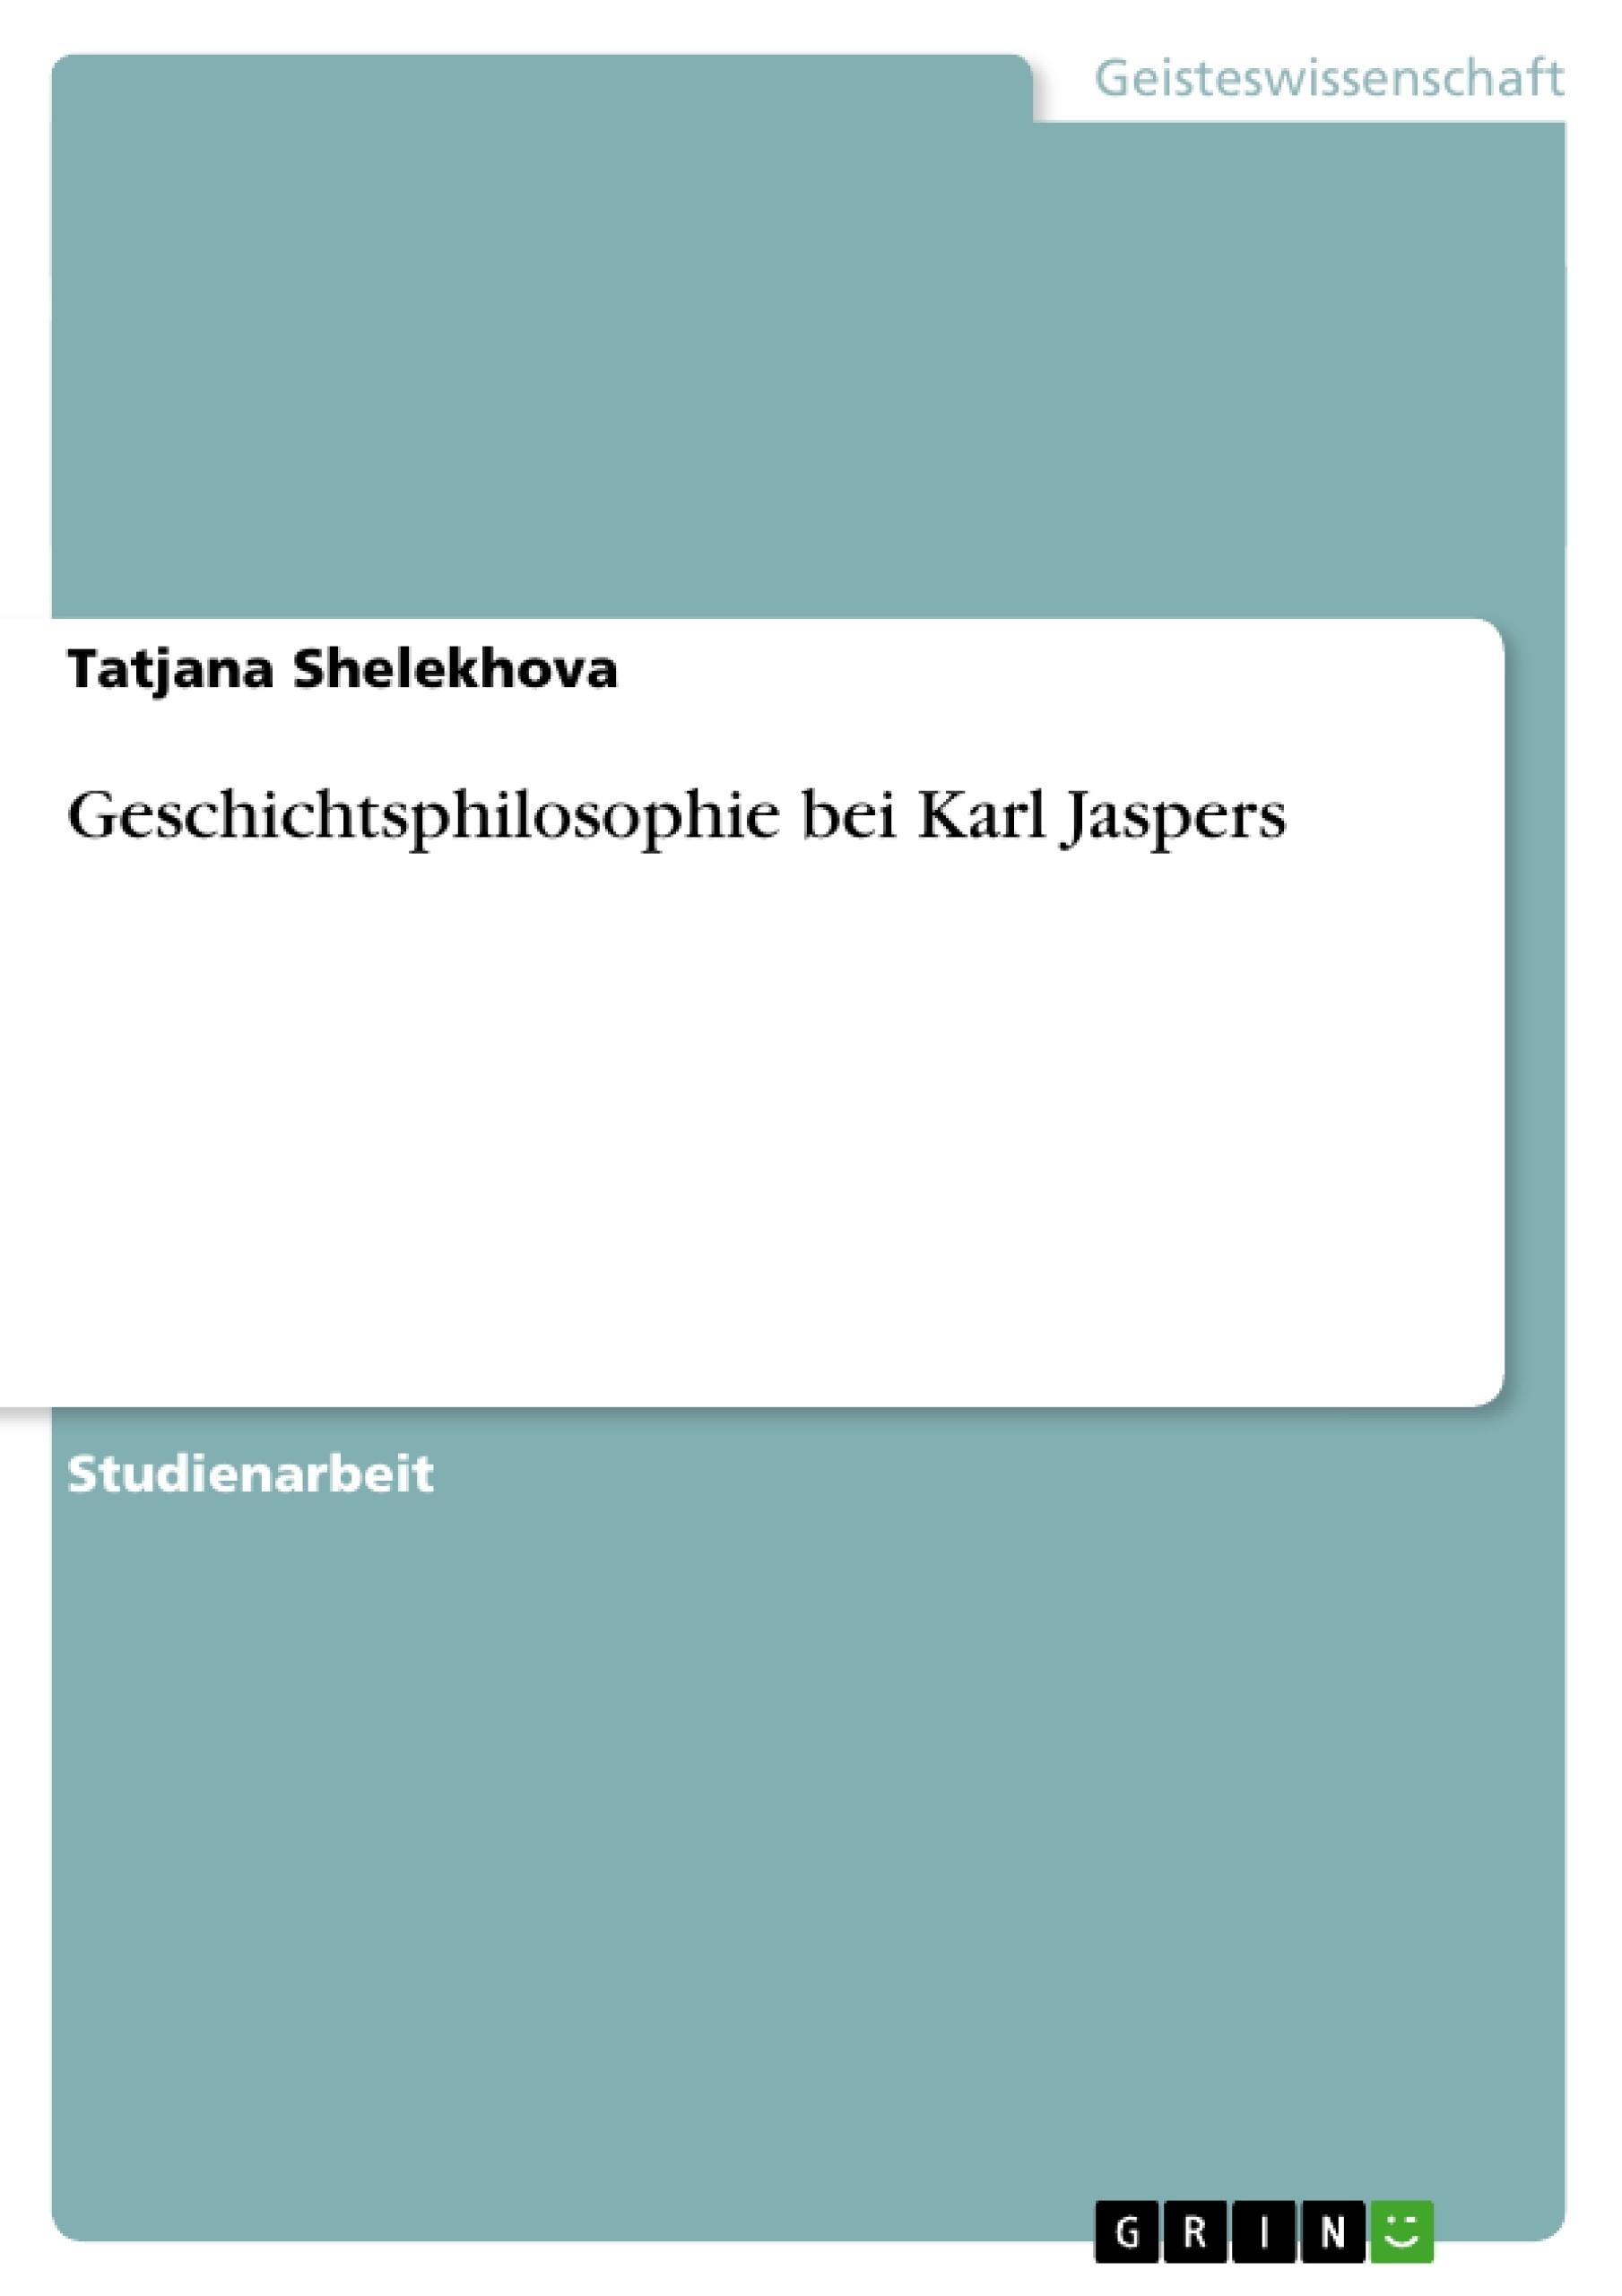 Titel: Geschichtsphilosophie bei Karl Jaspers